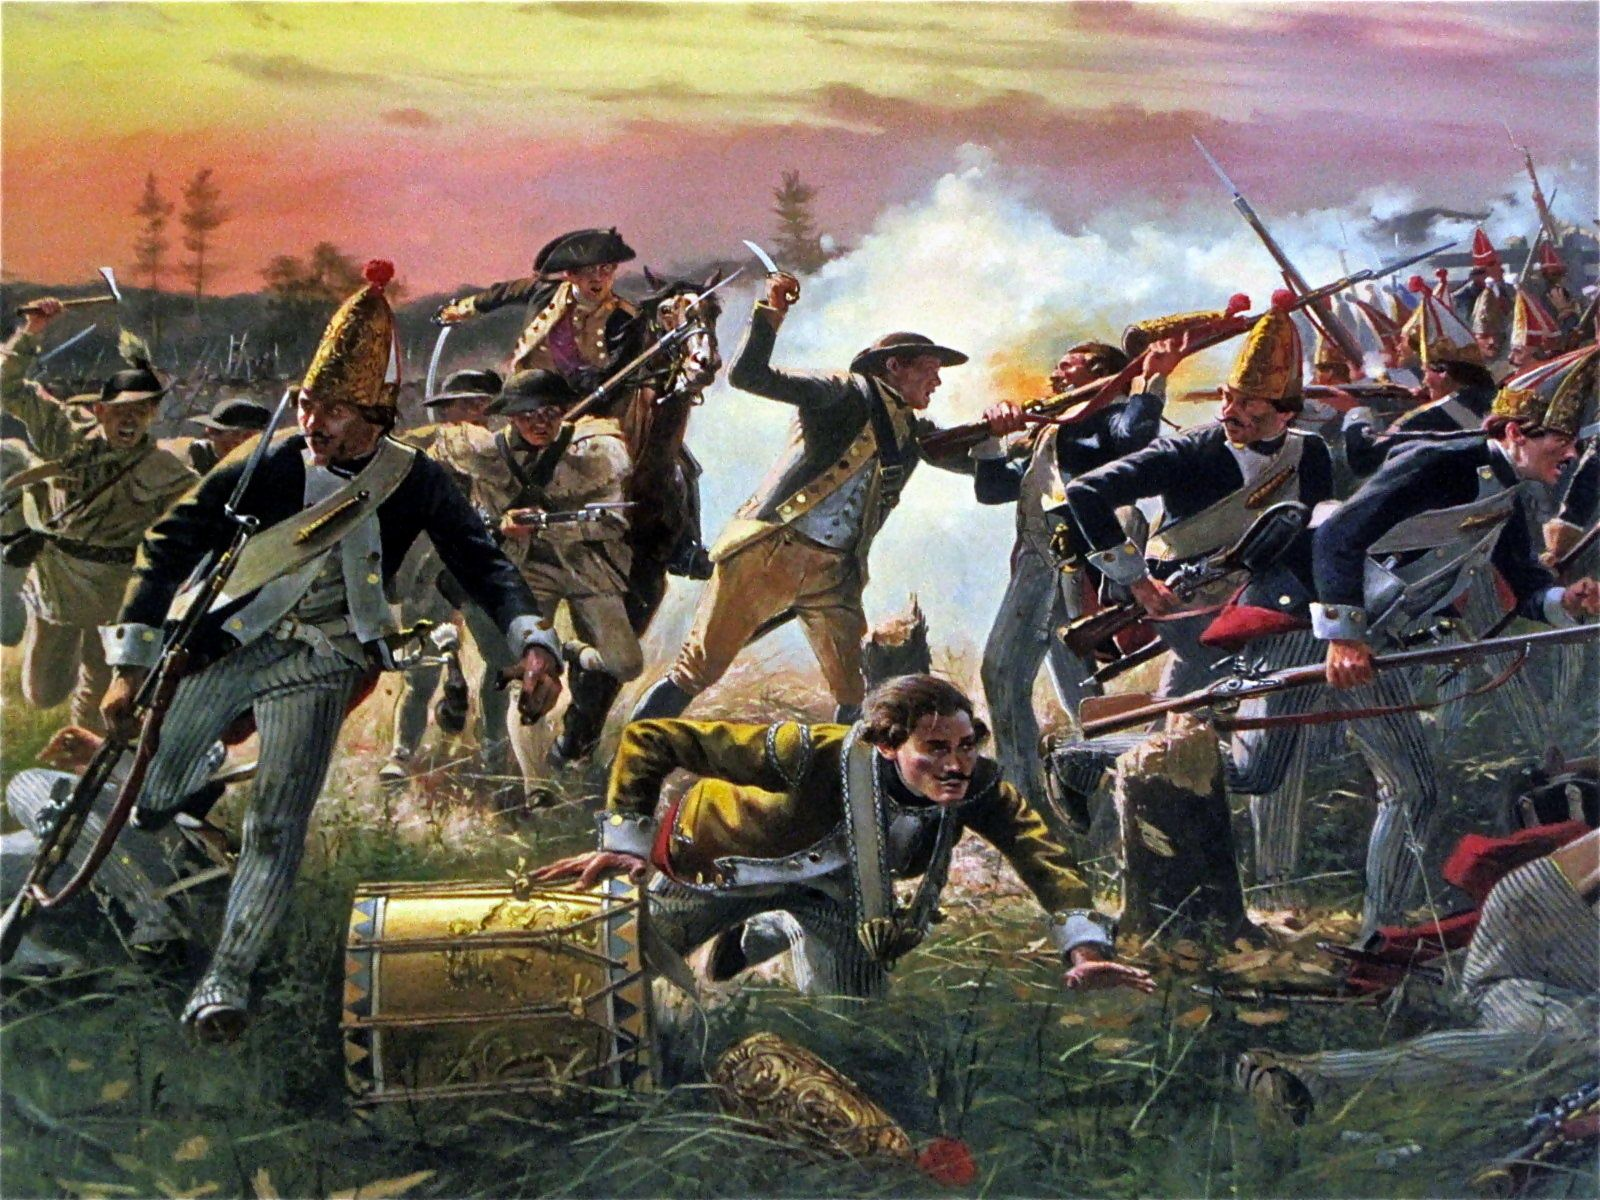 Breyman S Redoubt Battle Of Saratoga